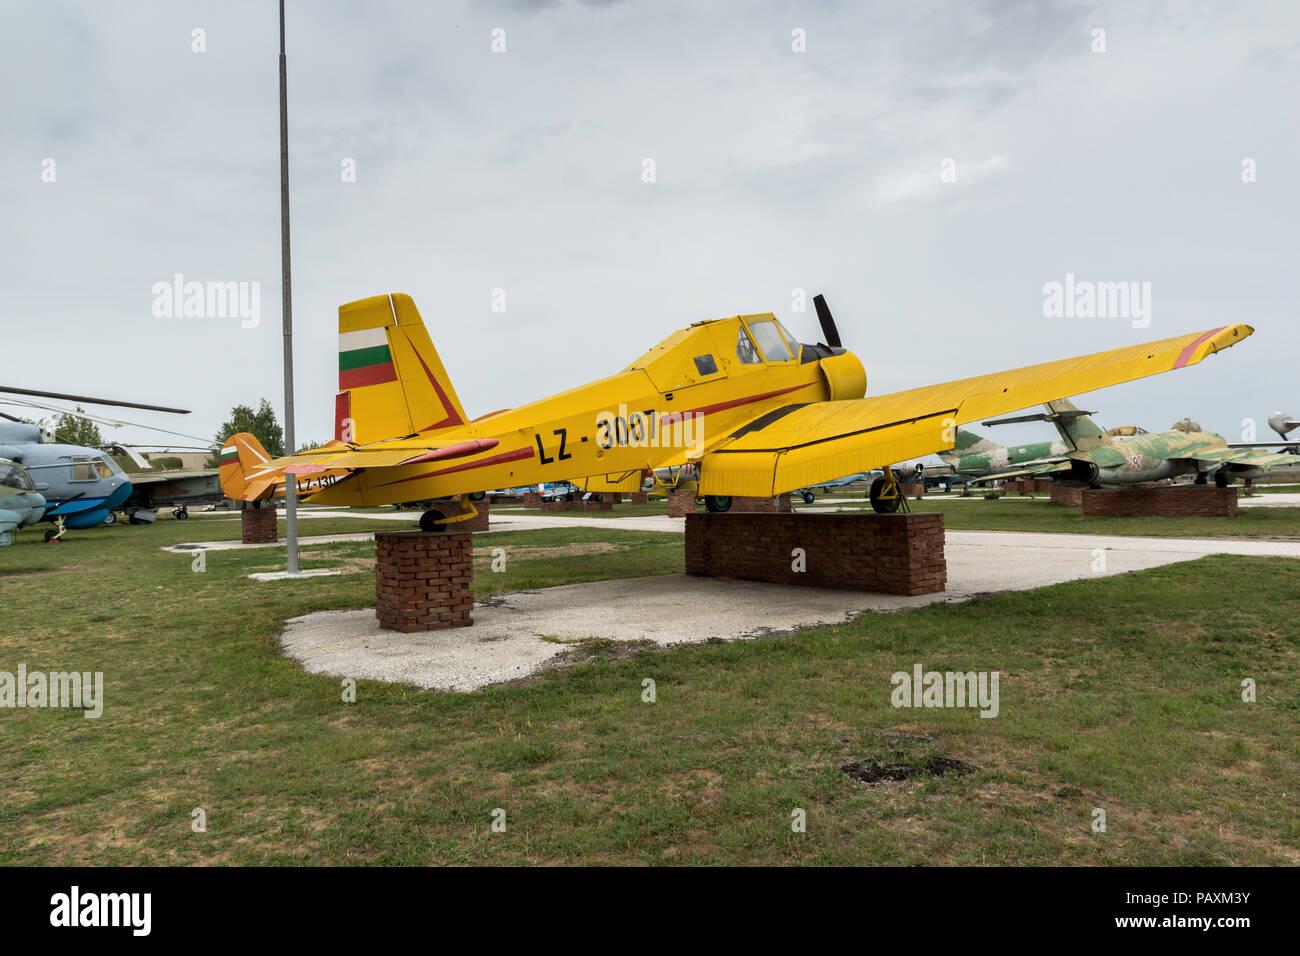 KRUMOVO, PLOVDIV, BULGARIA - 29 APRIL 2017: Plane LZ 3007 in Aviation Museum near Plovdiv Airport, Bulgaria Stock Photo